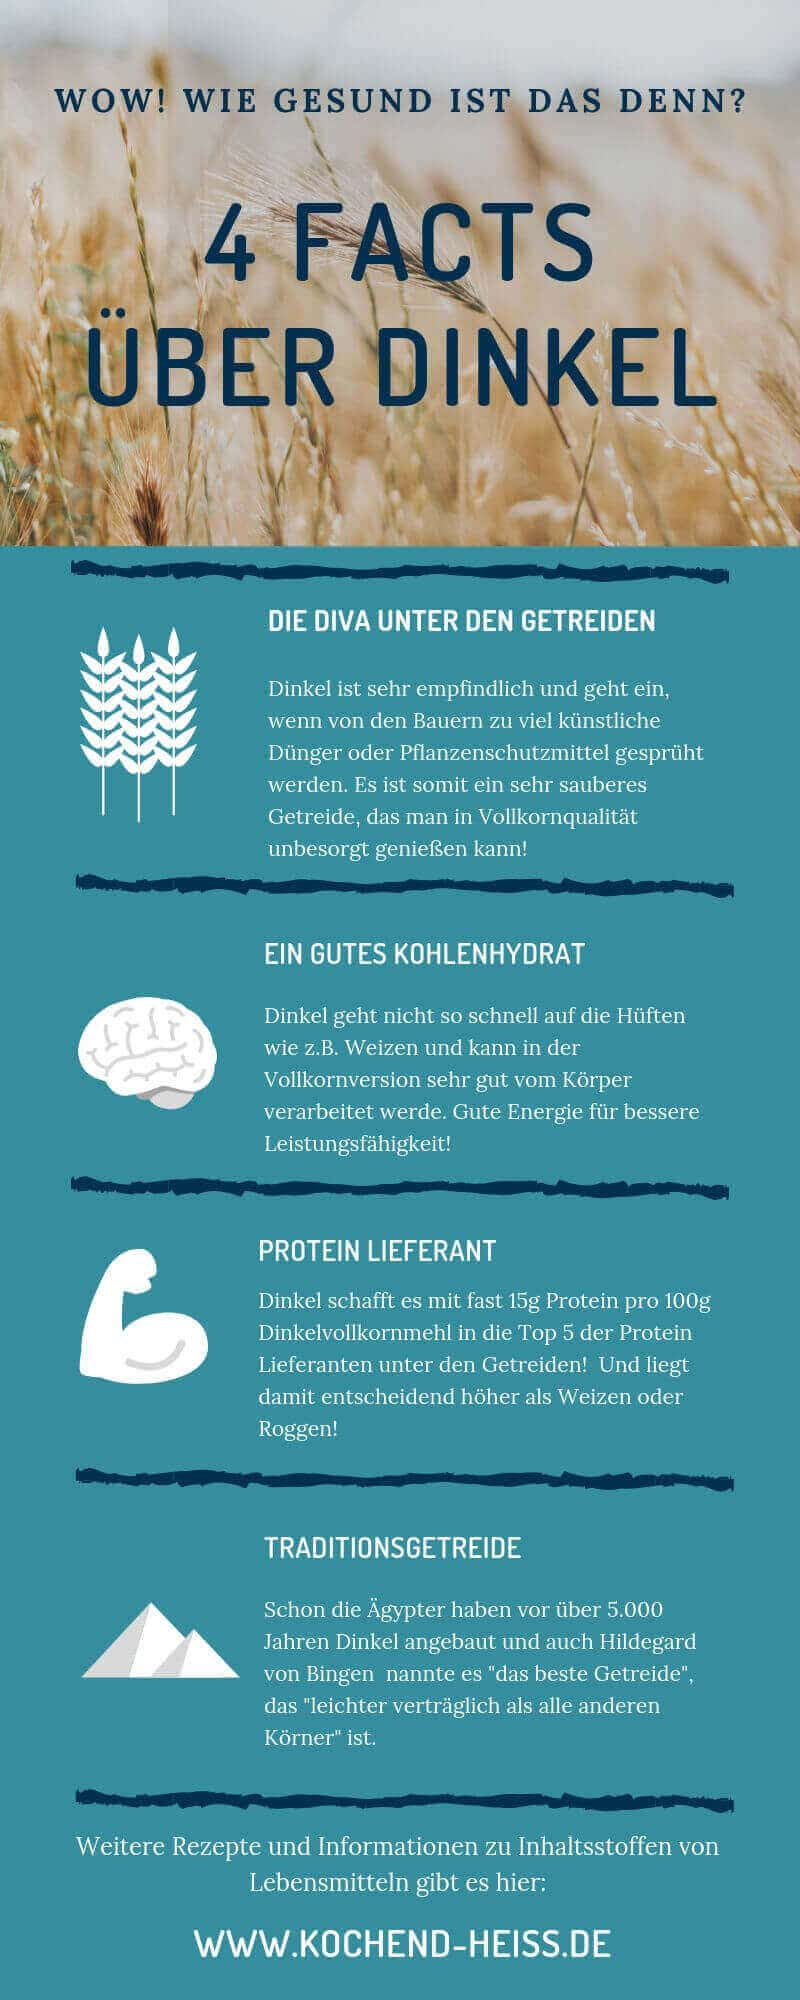 Dinkelvollkornbrot - Rezept zum Selberbacken